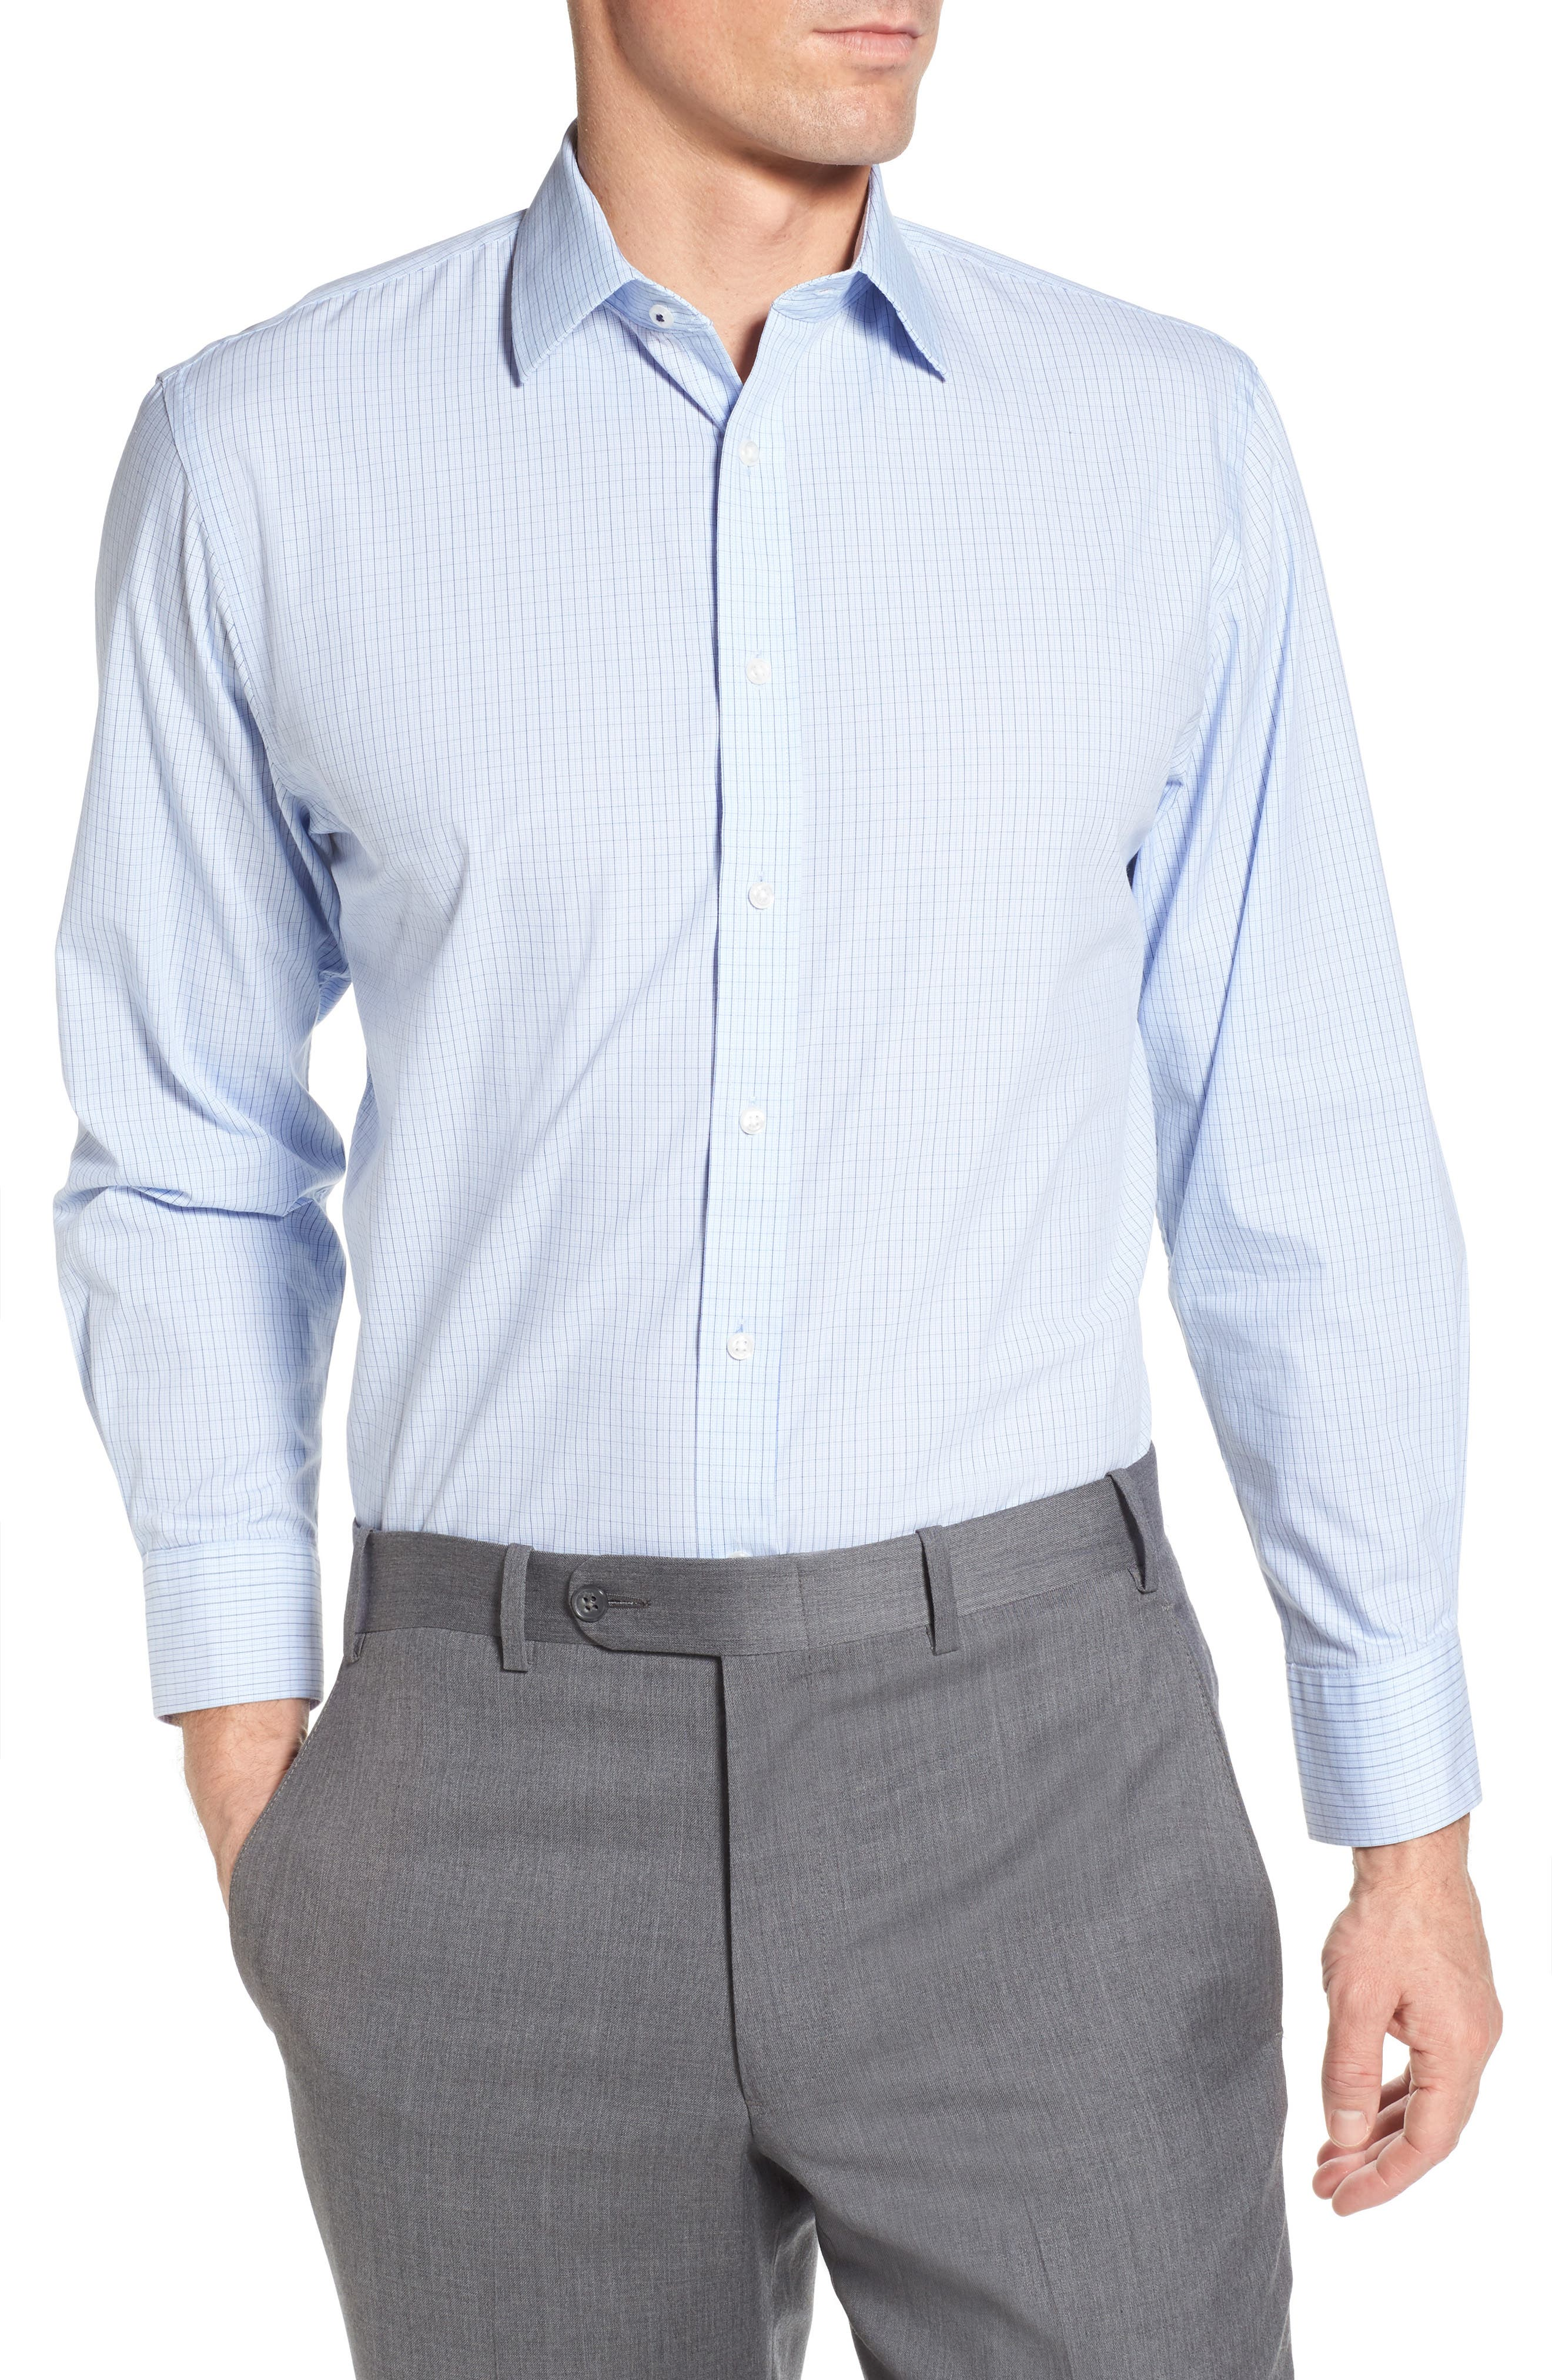 Main Image - Nordstrom Men's Shop Tech-Smart Traditional Fit Check Dress Shirt